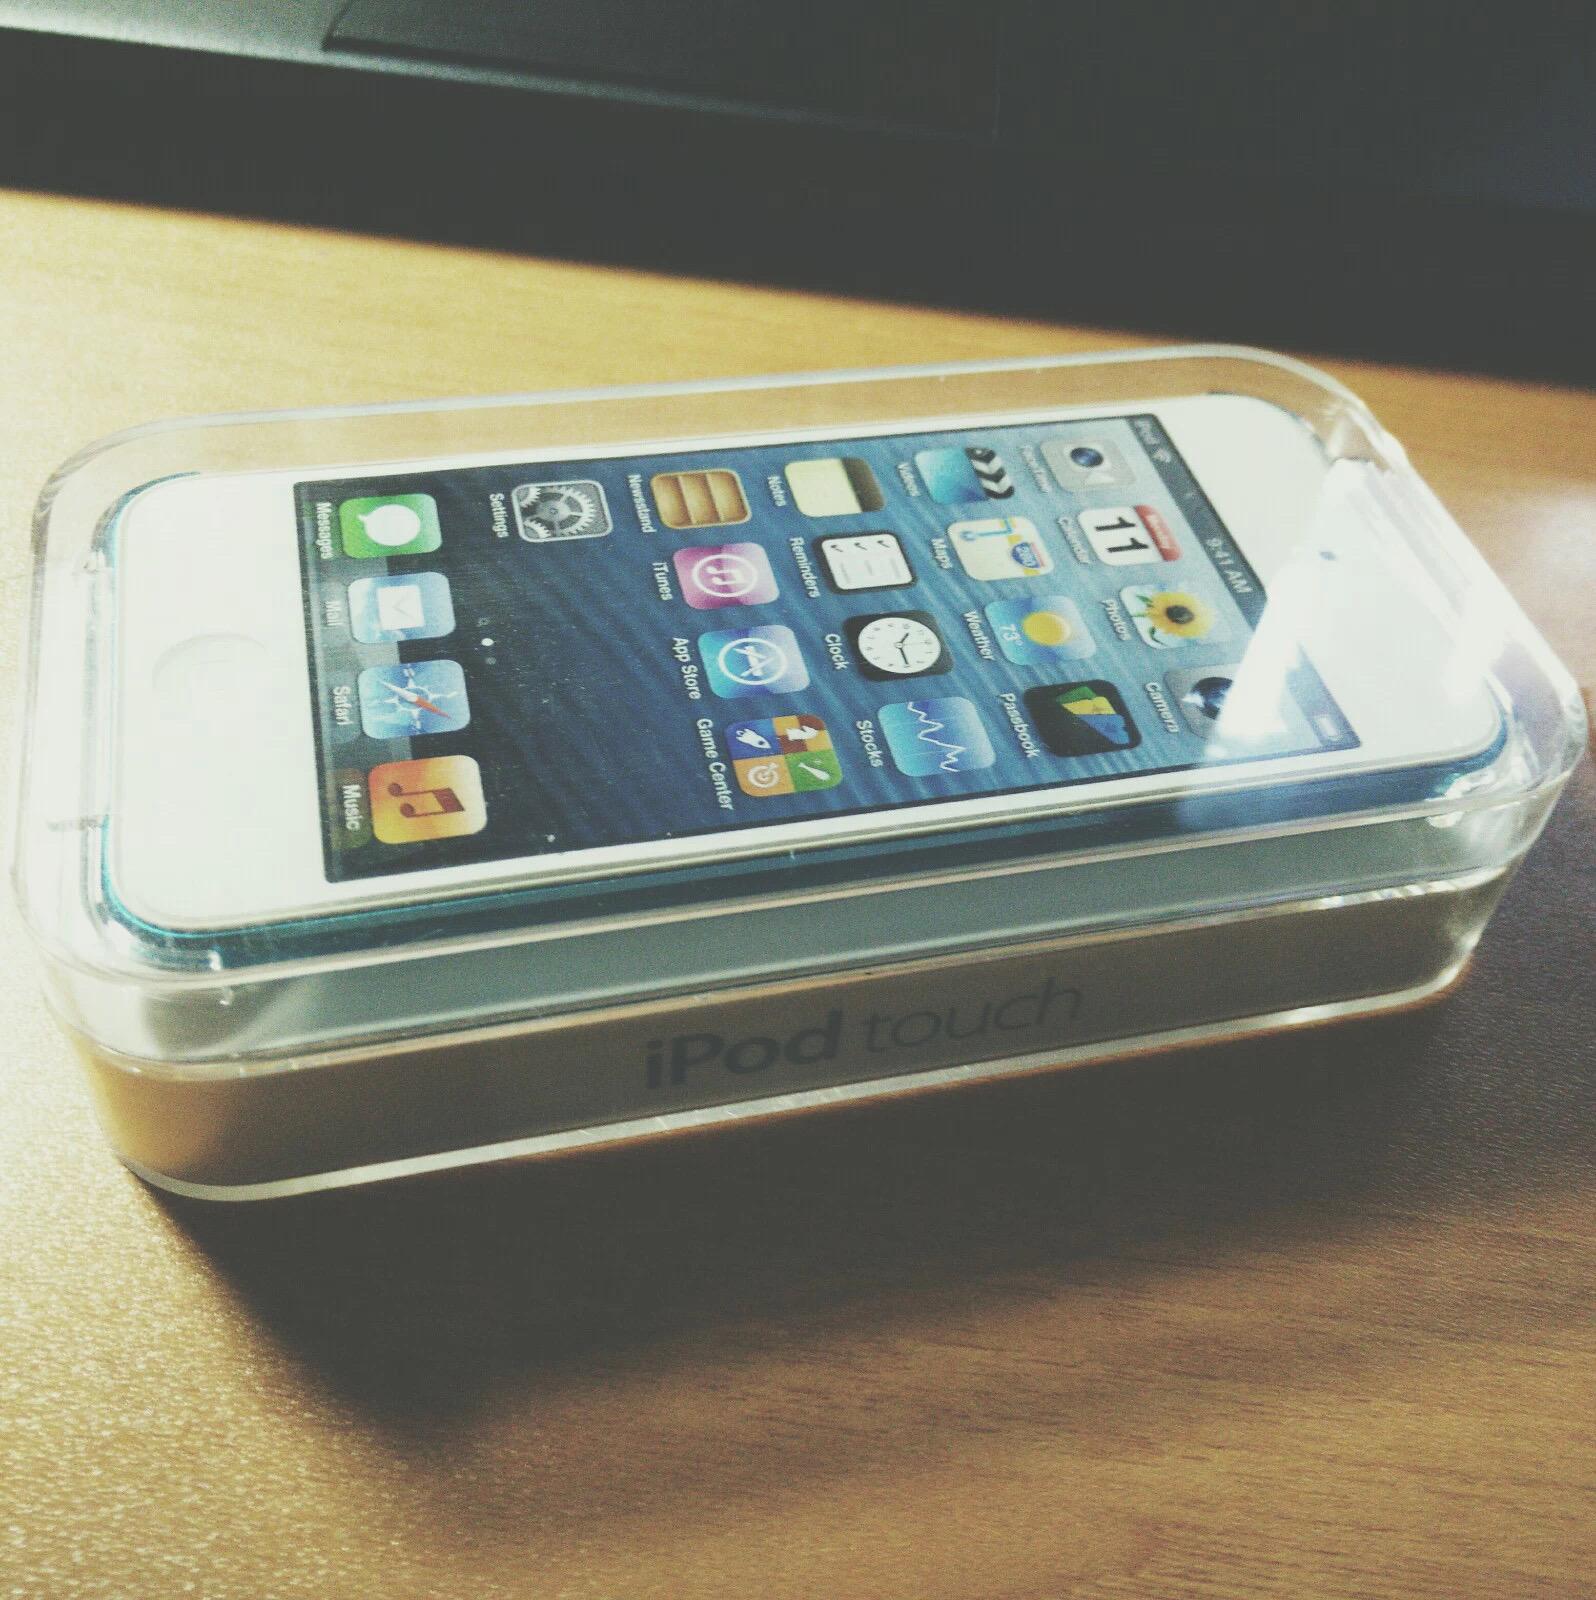 卖出 iPod touch 5 前留影